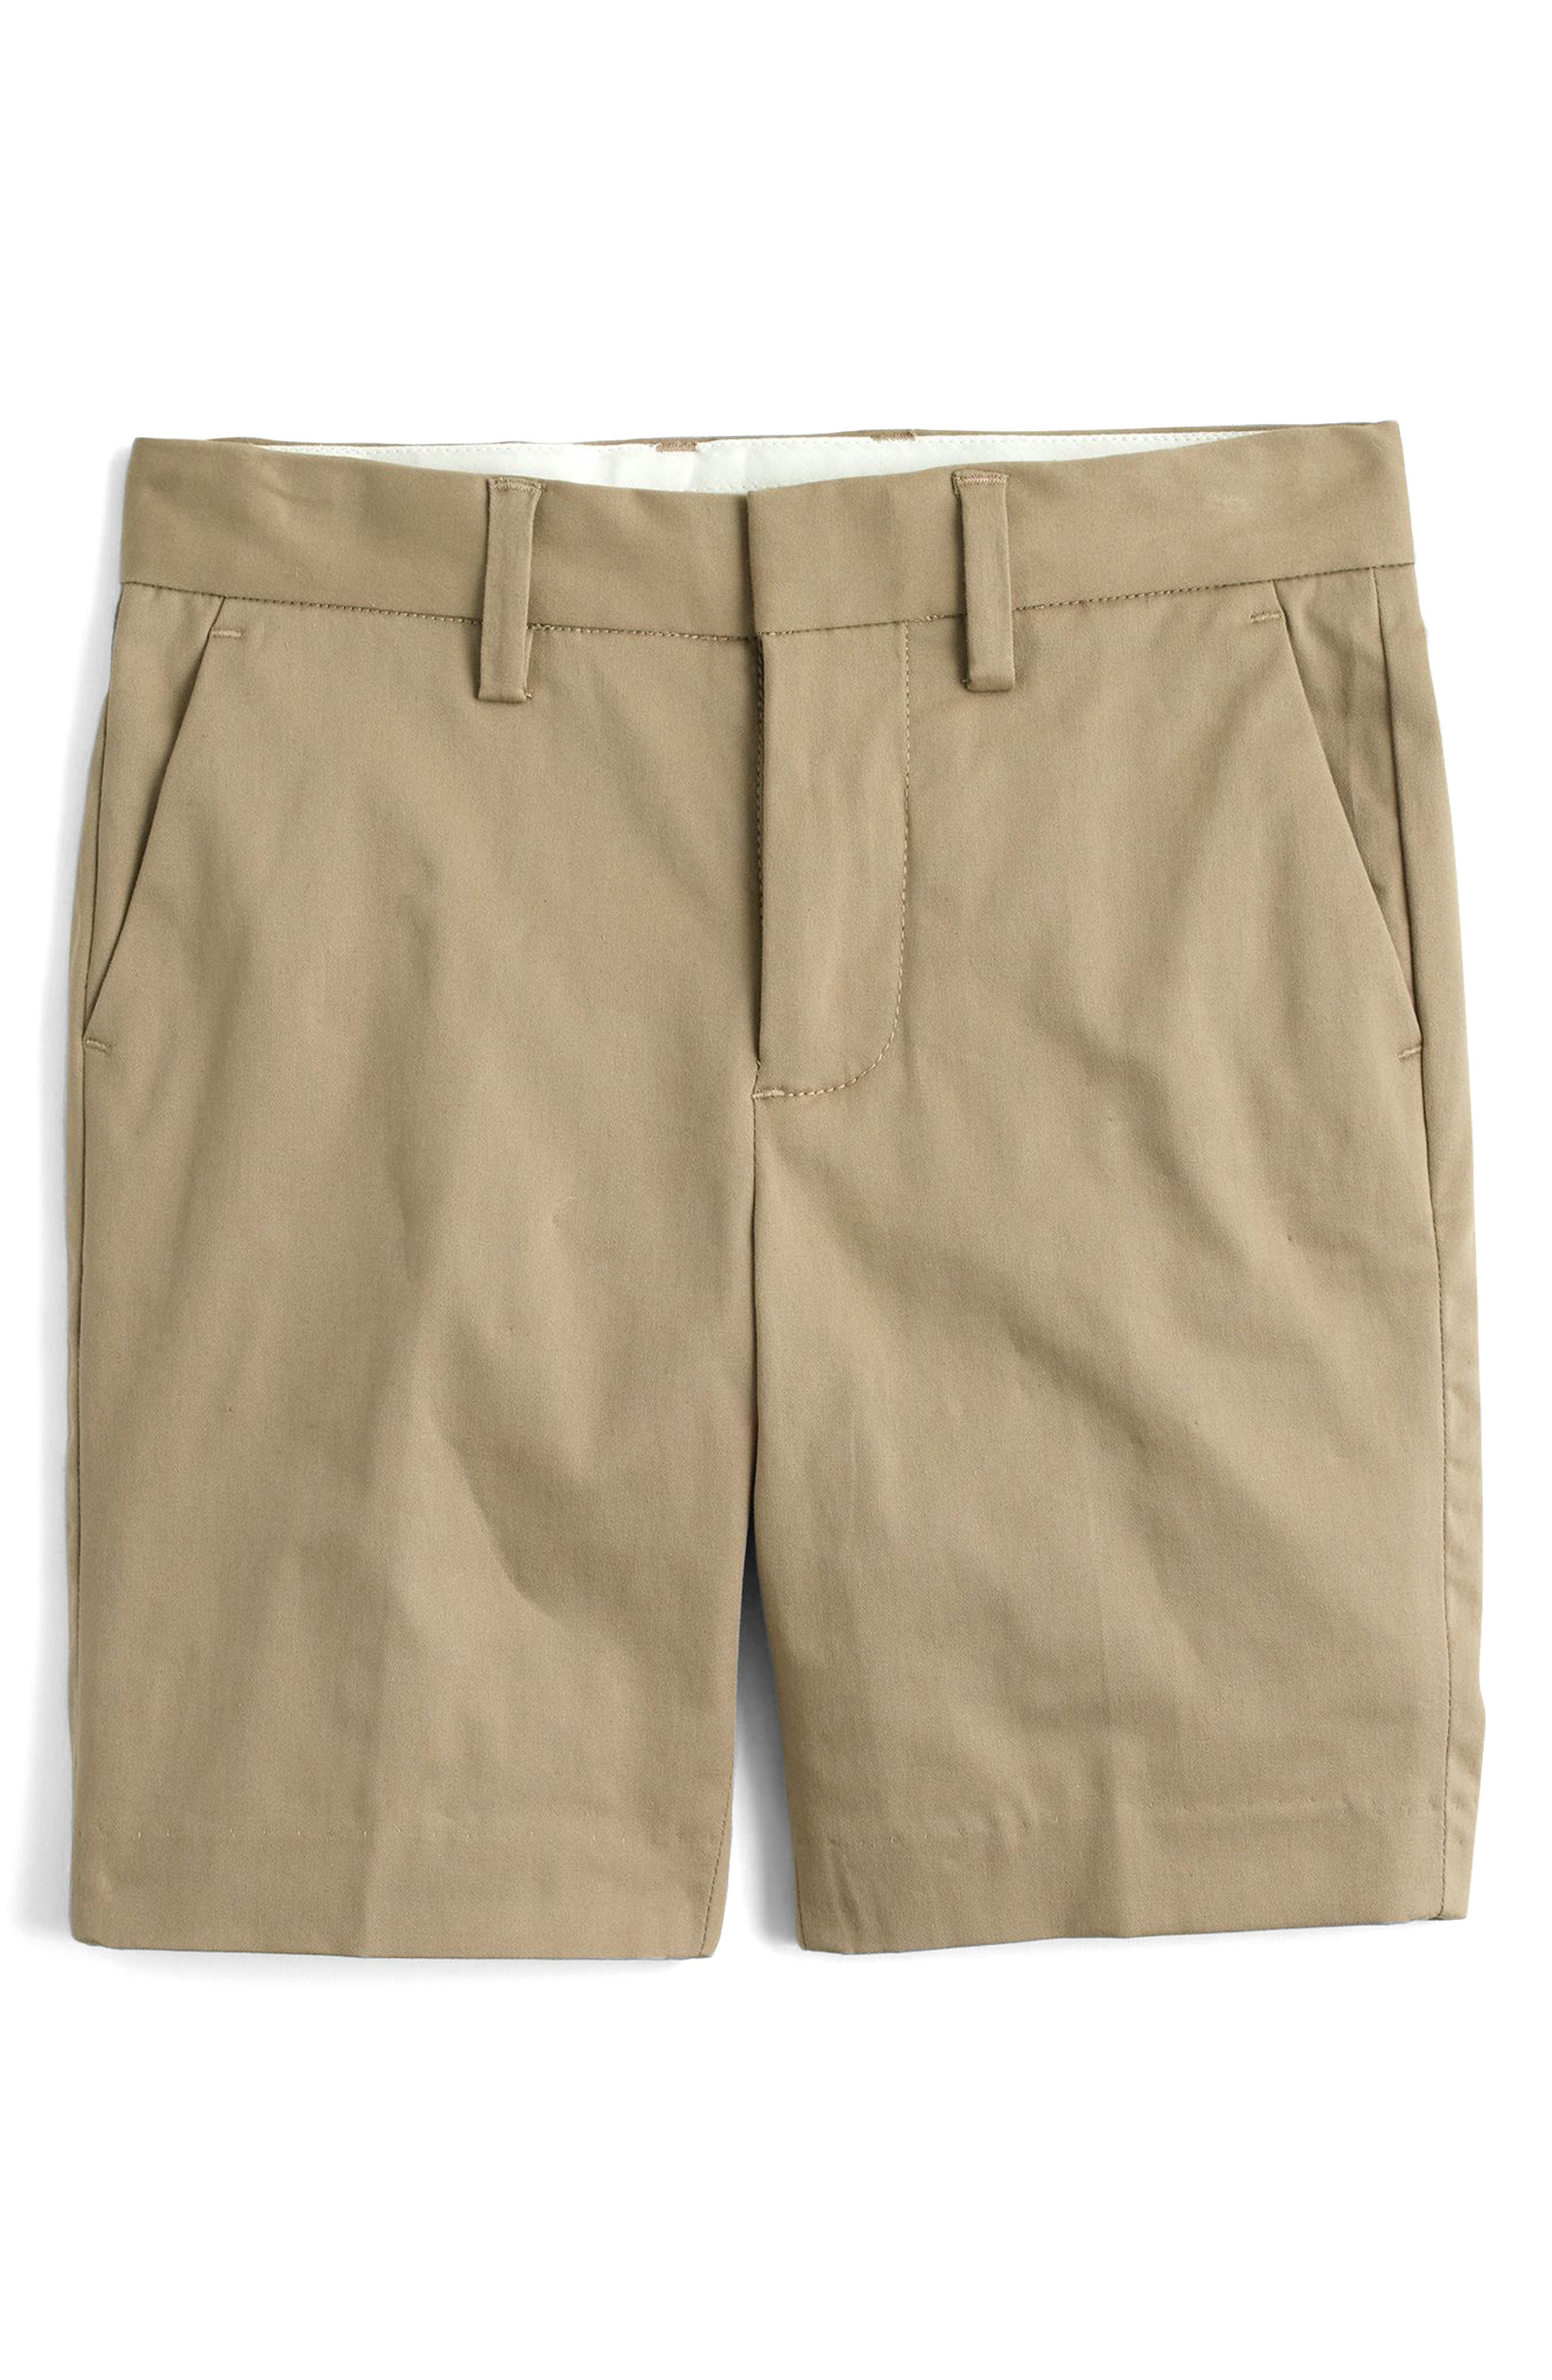 crewcuts by J.Crew Ludlow Chino Shorts (Toddler Boys, Little Boys & Big Boys)